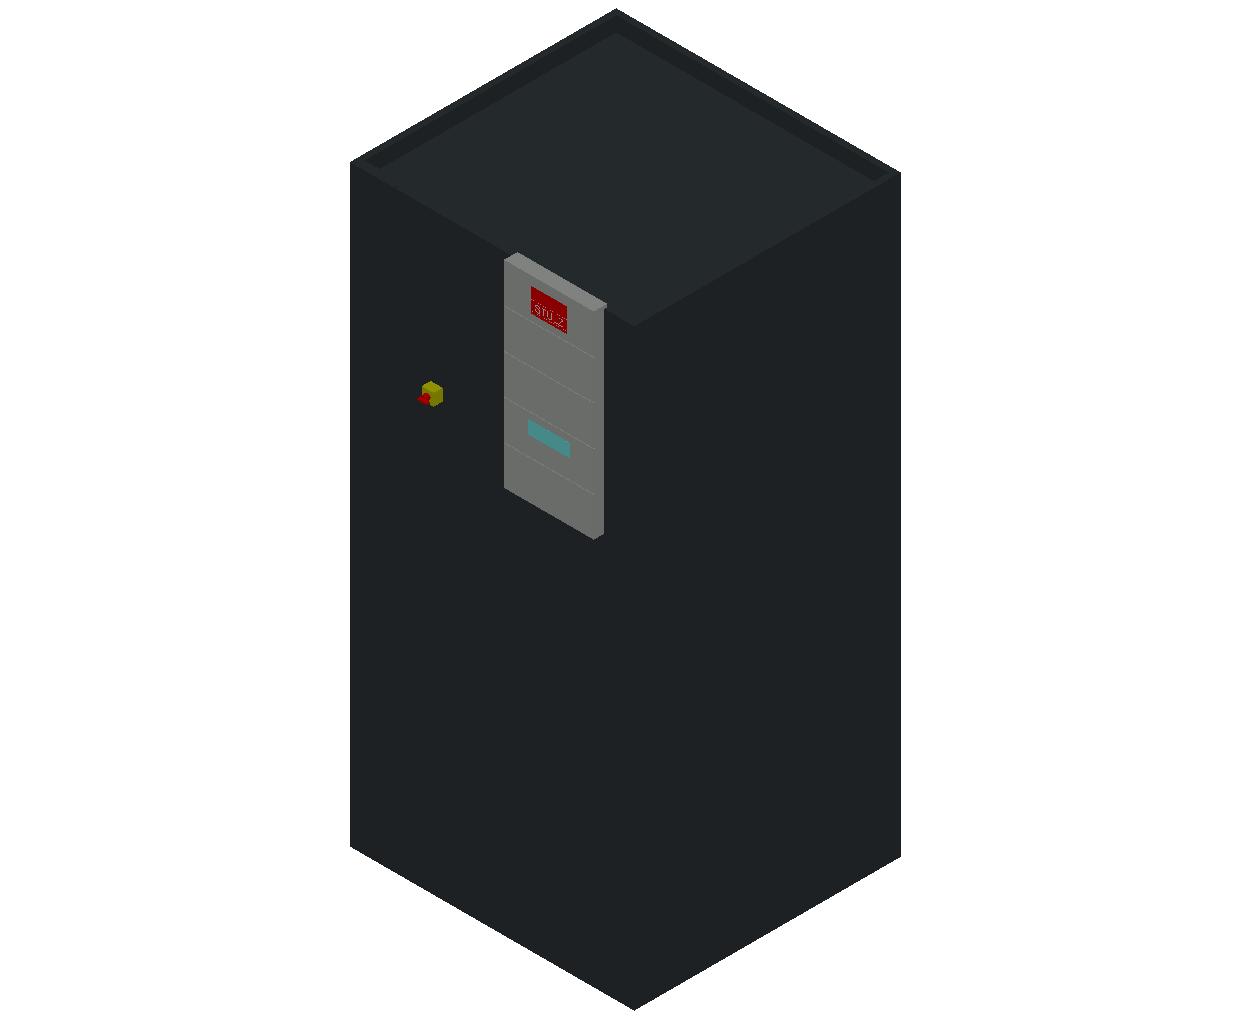 HC_Air Conditioner_Indoor Unit_MEPcontent_STULZ_CyberAir 3PRO_ASD-ALD_Single Circuit GE_ASD_211_GE_INT-EN.dwg